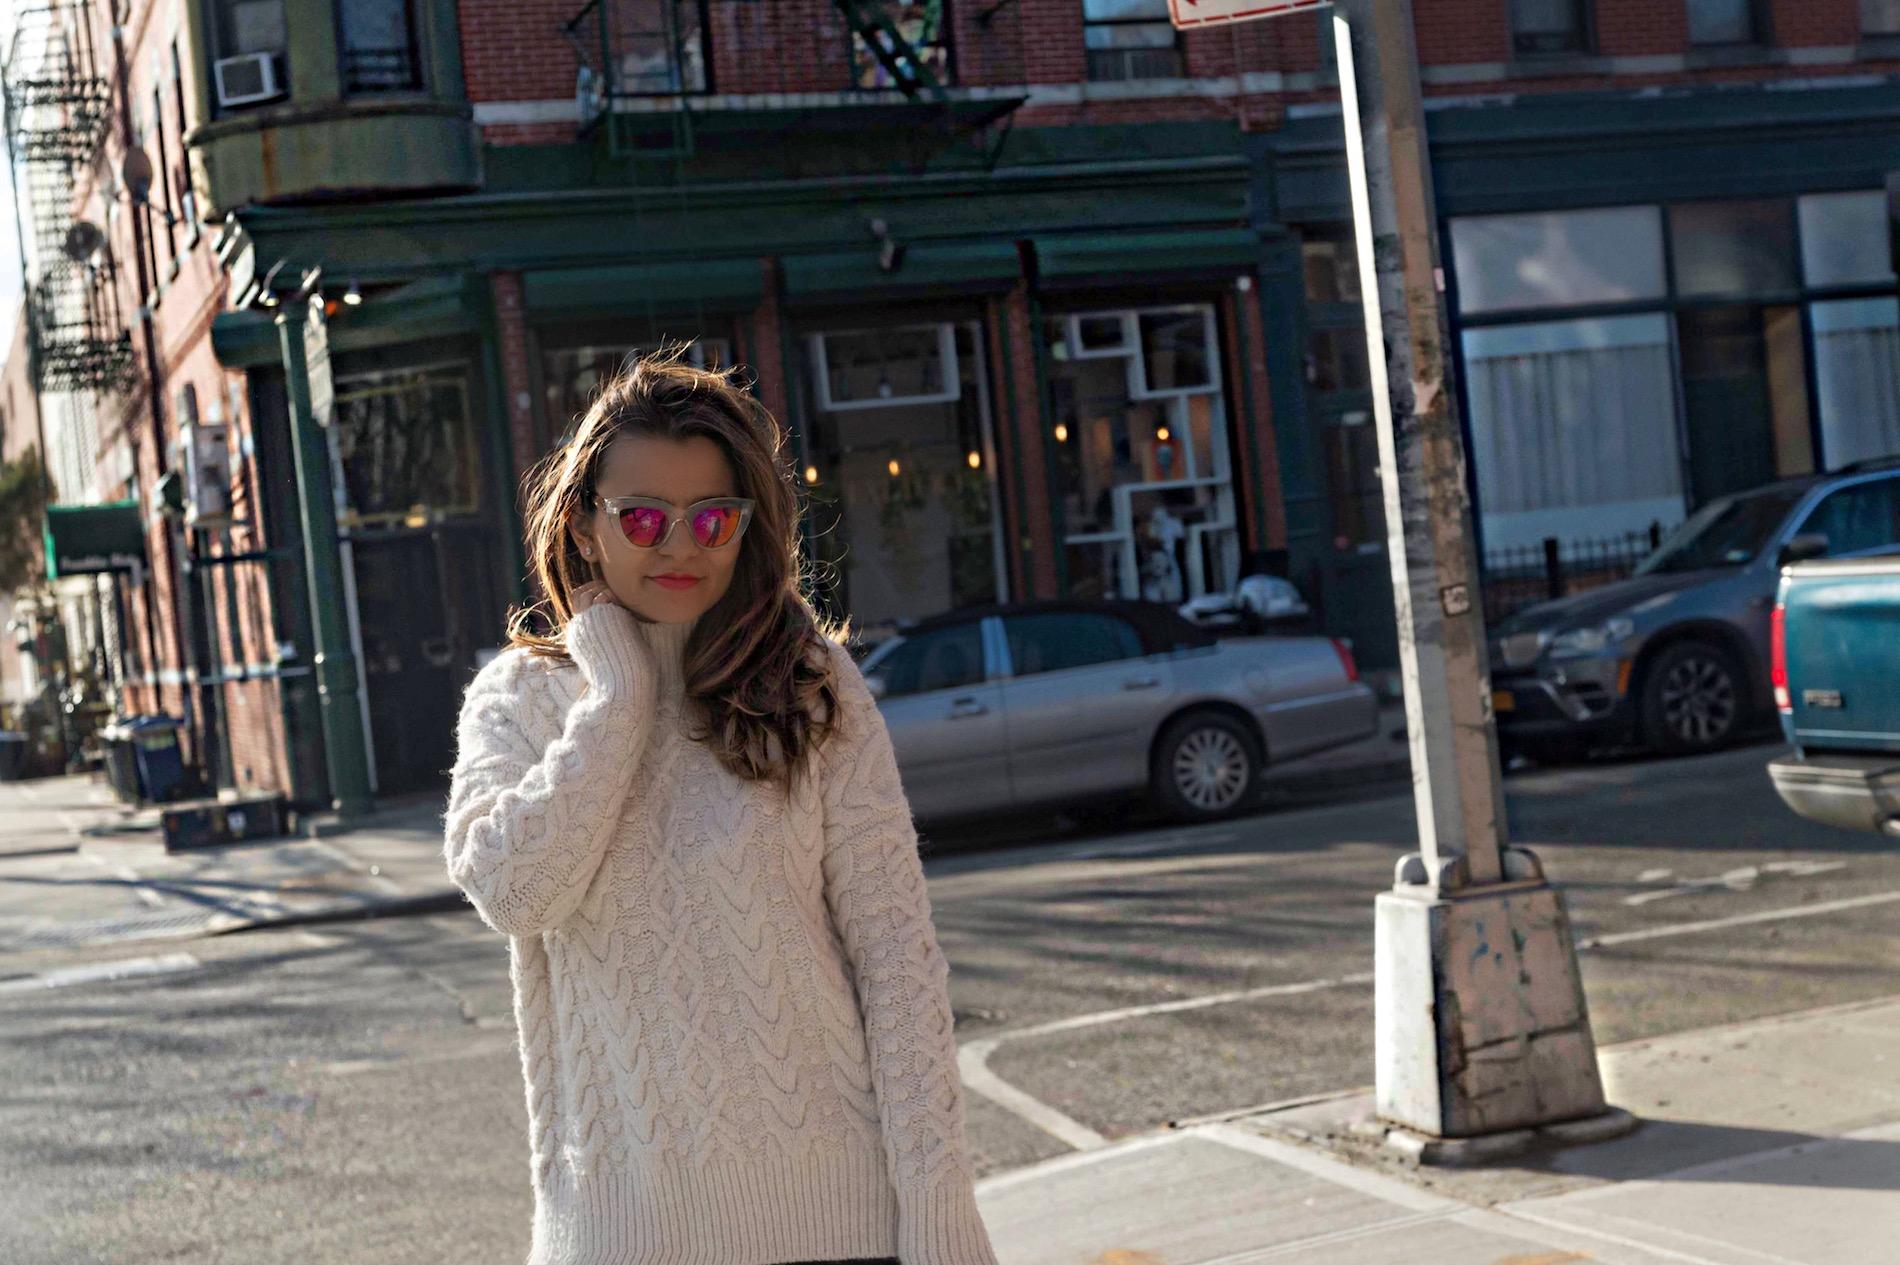 oversized-sweater-alley-girl-fashion-technology-blogger-betul-yildiz